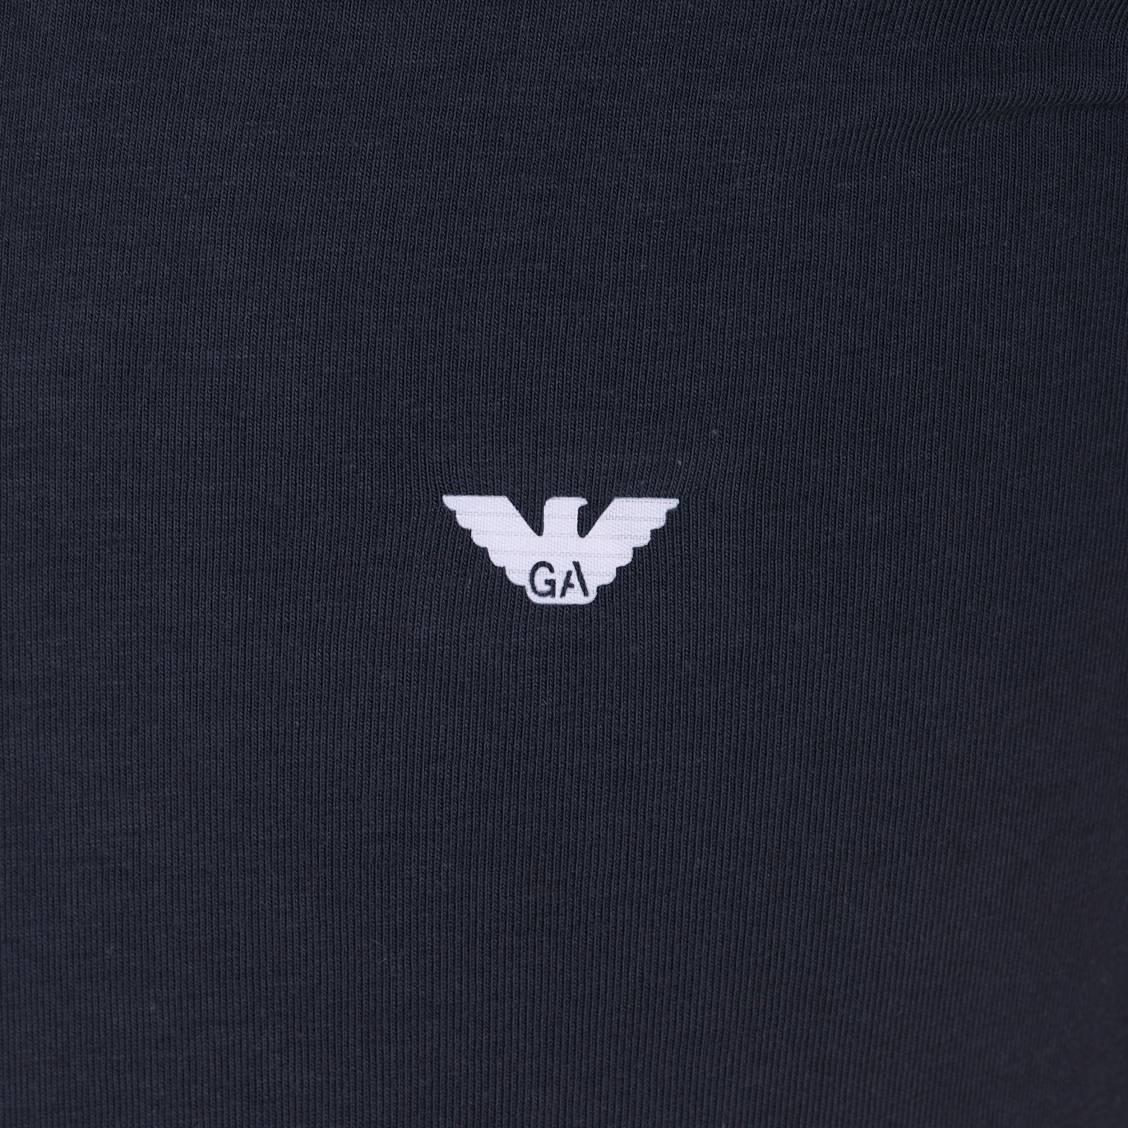 emporio armani logo wallpaper